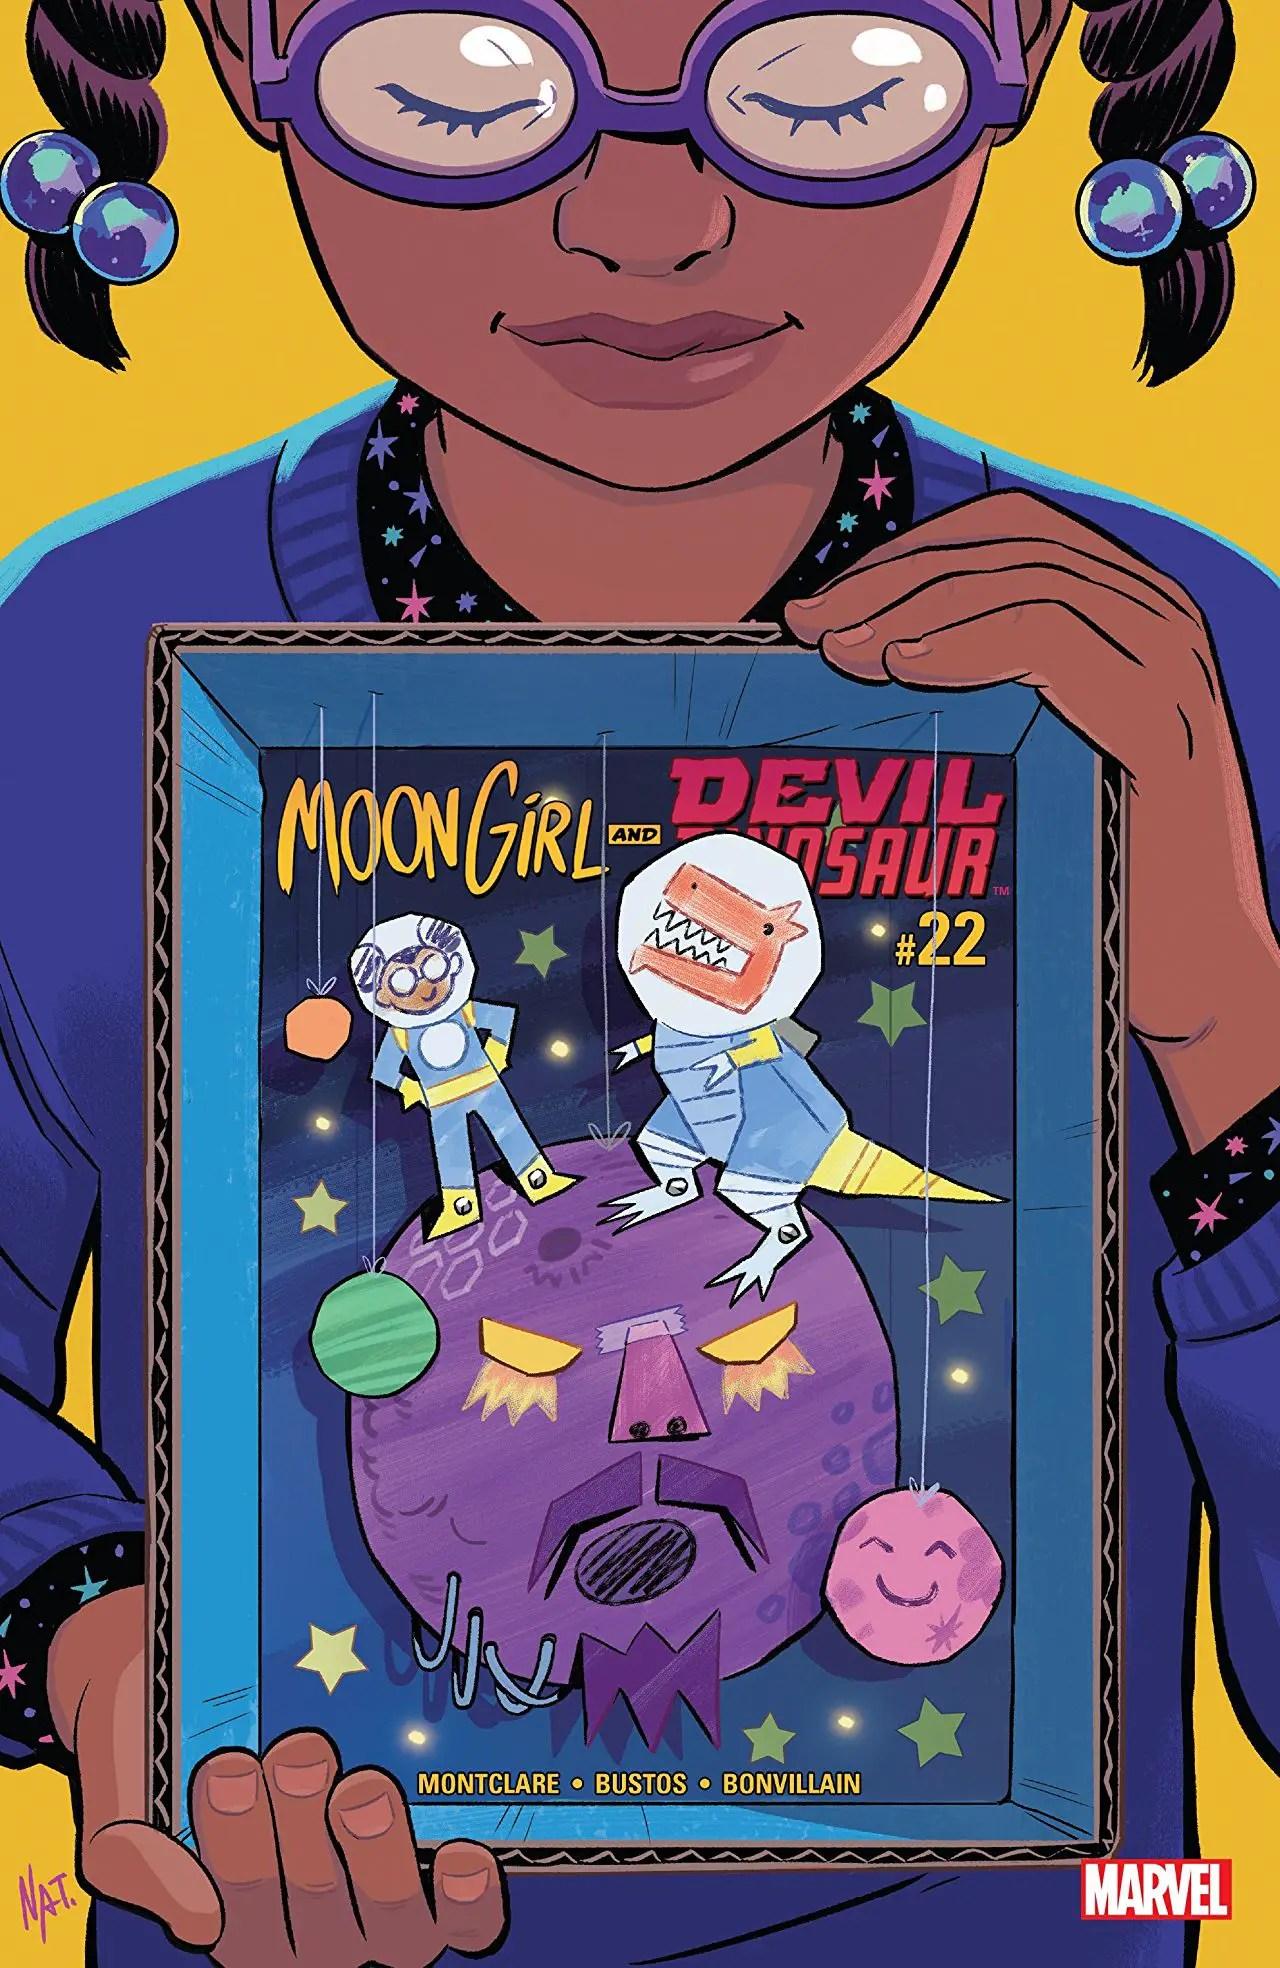 3 Reasons Why: 'Moon Girl and Devil Dinosaur Vol. 4: Girl-Moon' is Saturday morning cartoon fun